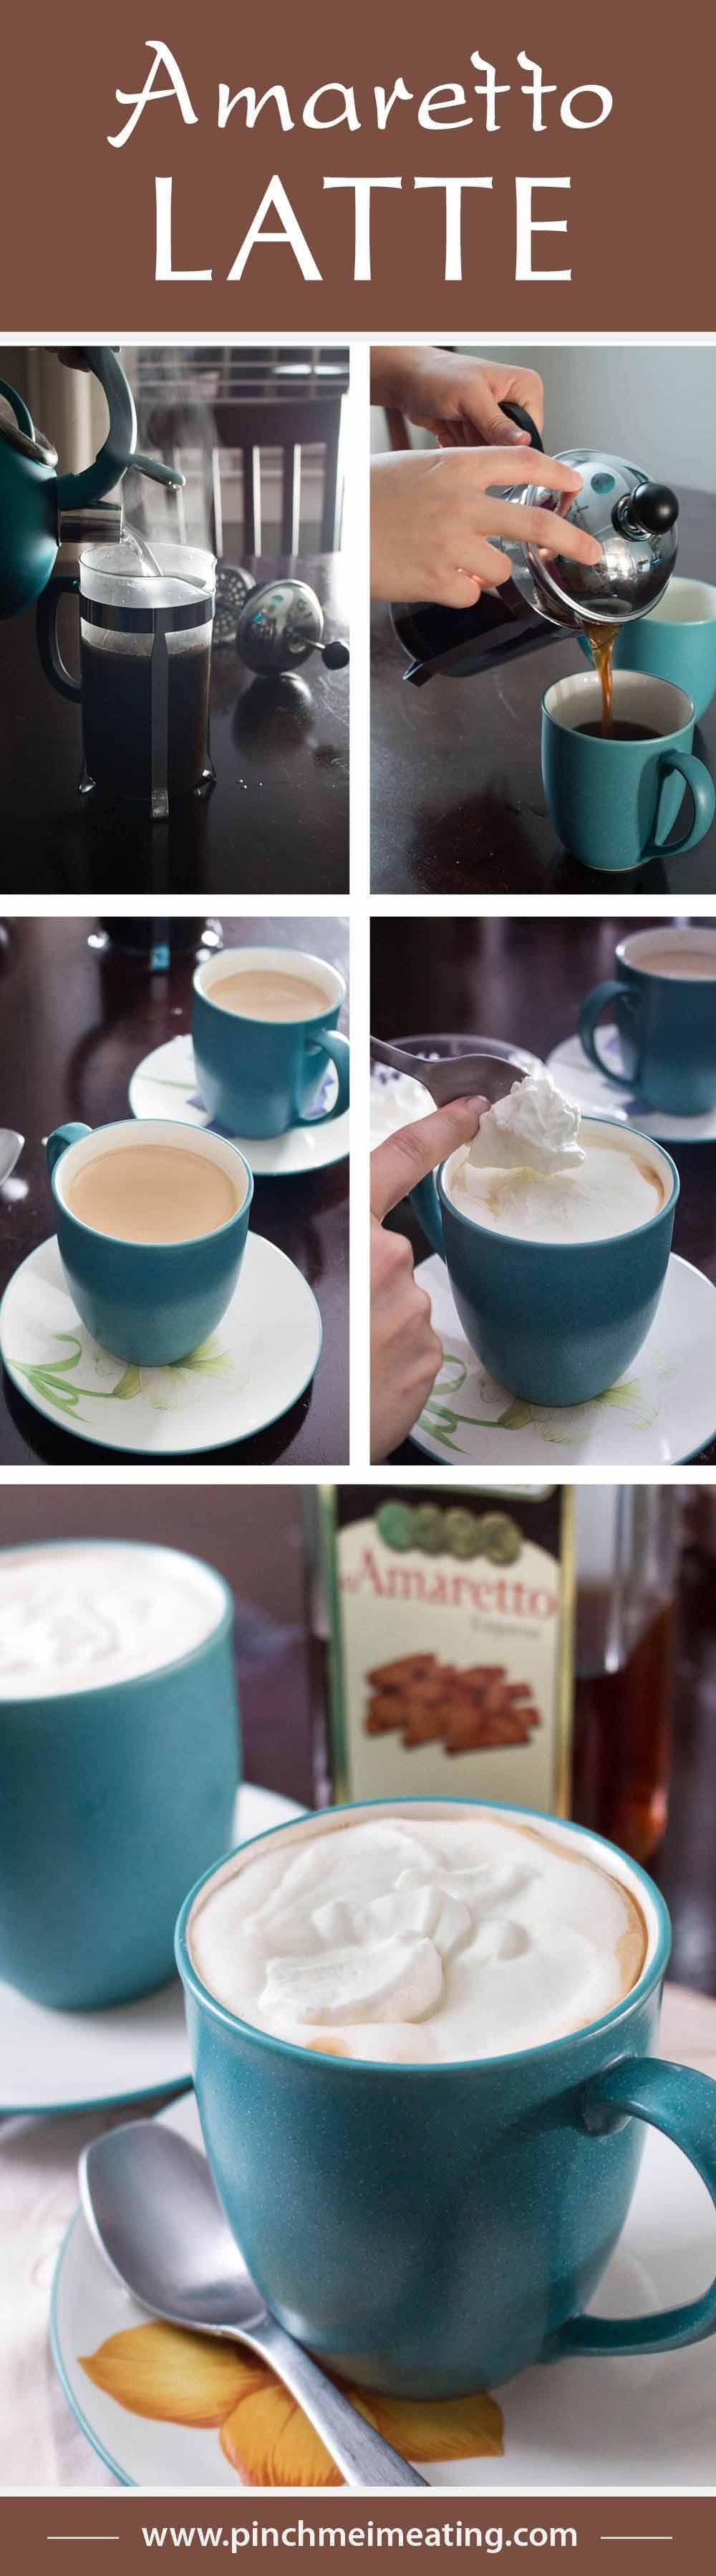 Amaretto latte pinch me im eating recipe coffee